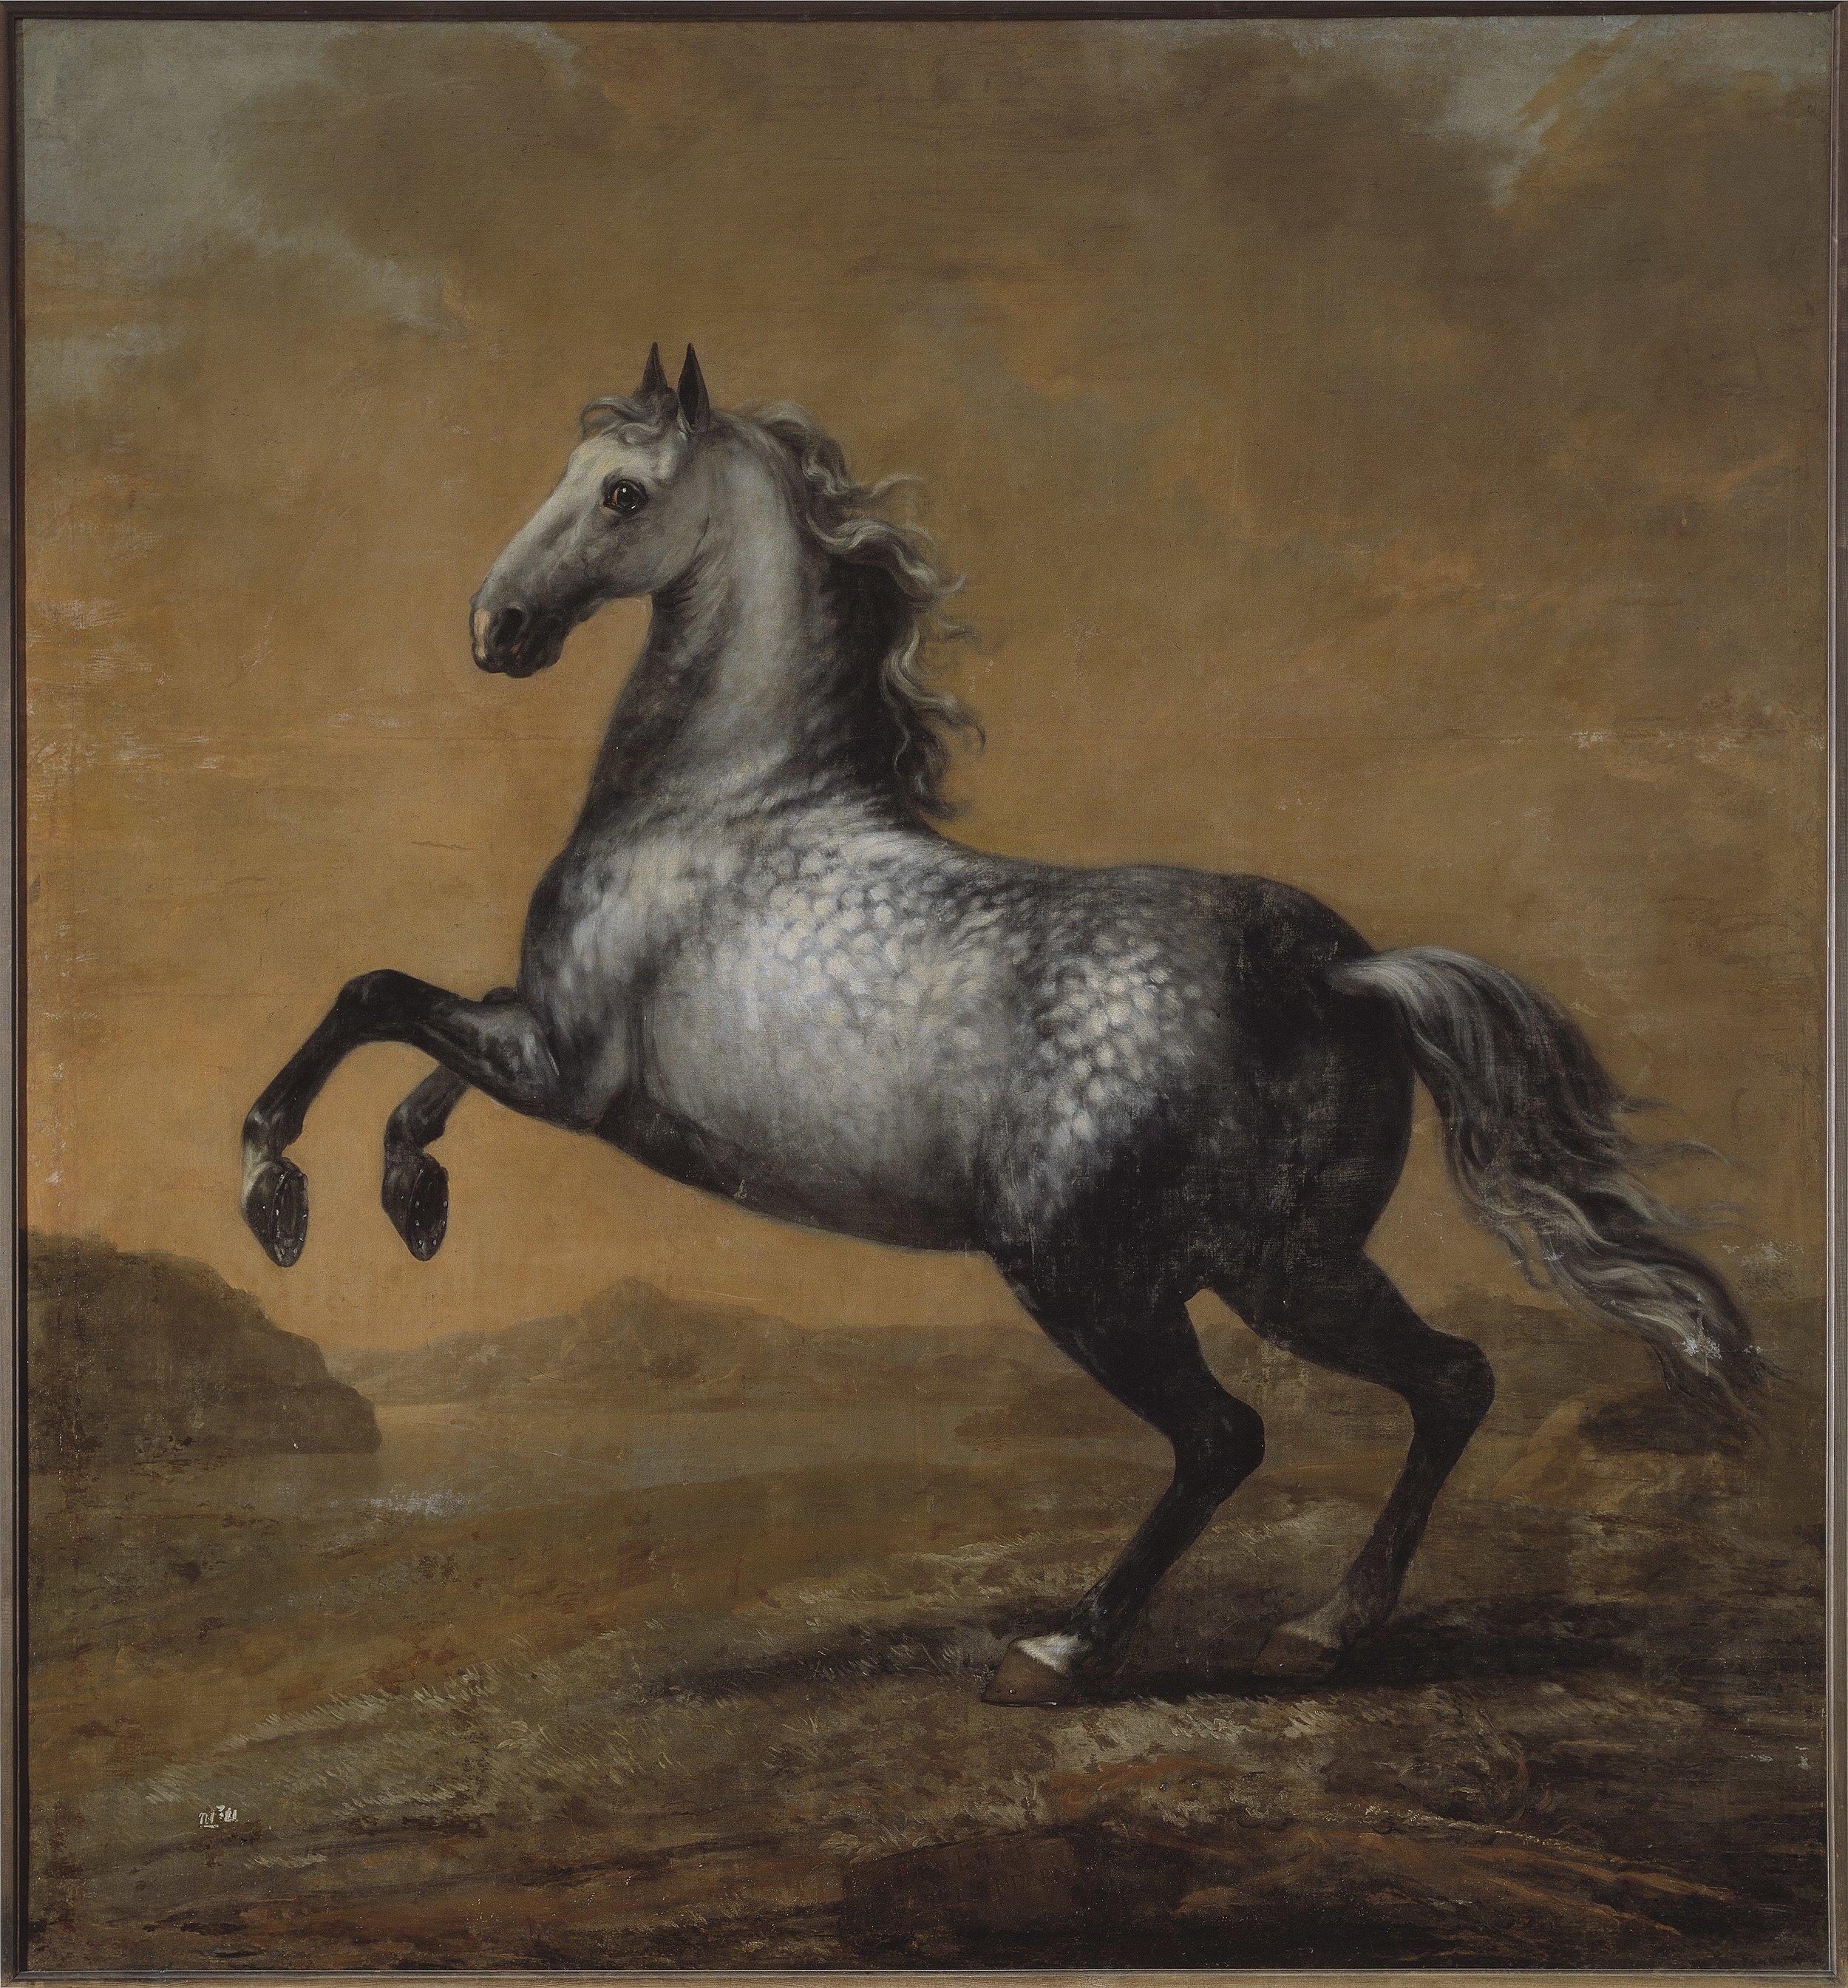 David Klöcker Ehrenstrahl,  Karl XIs livhäst Den Lille Engländaren, 1680-1689, Nationalmuseum